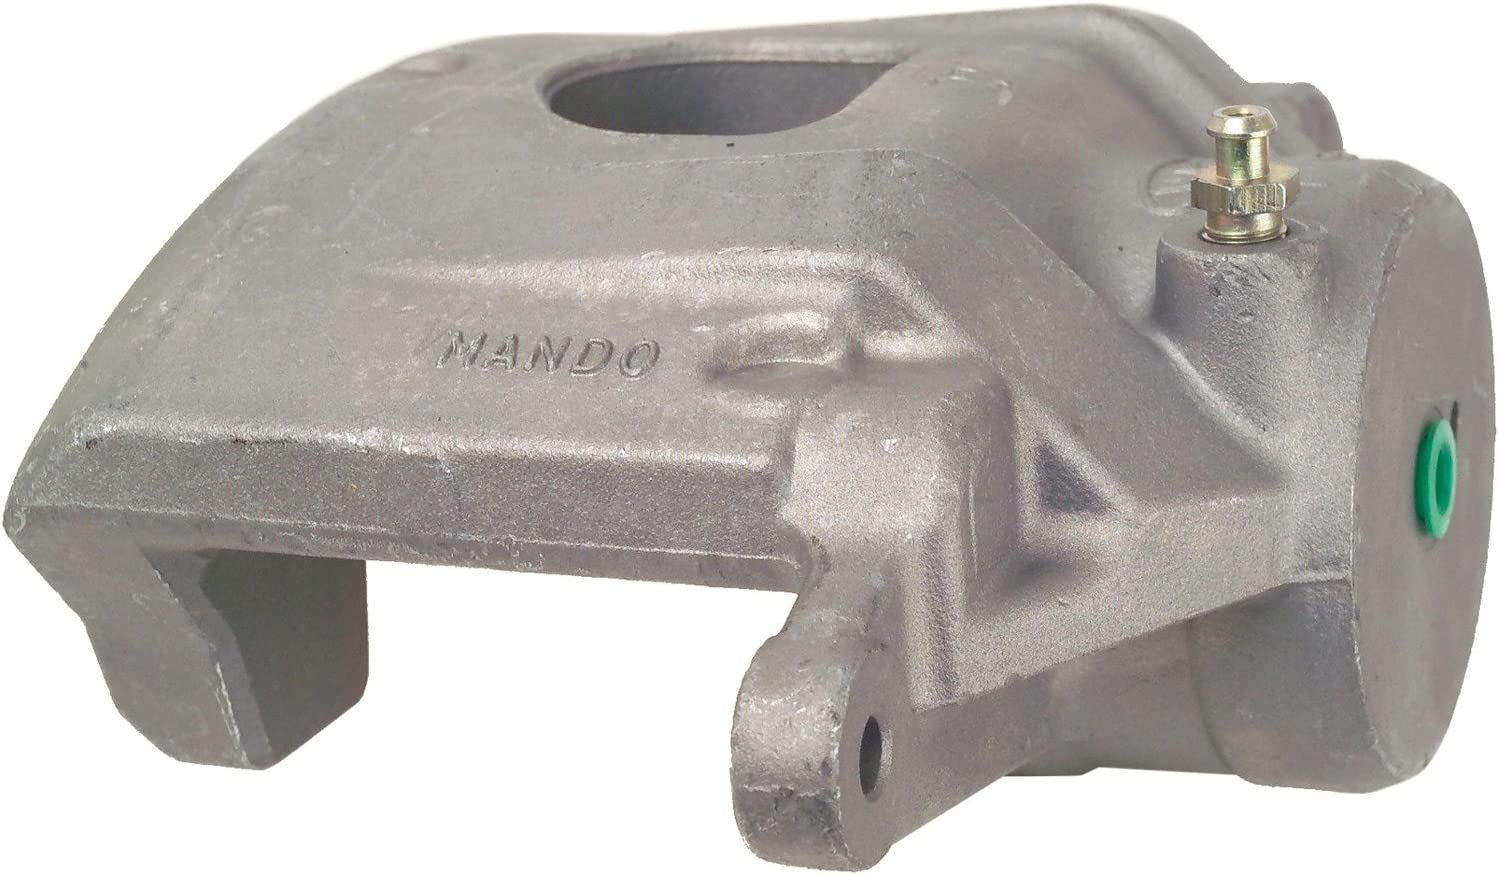 Cardone 19-B2980 Remanufactured Import Friction Ready Brake Caliper A1 Cardone Unloaded